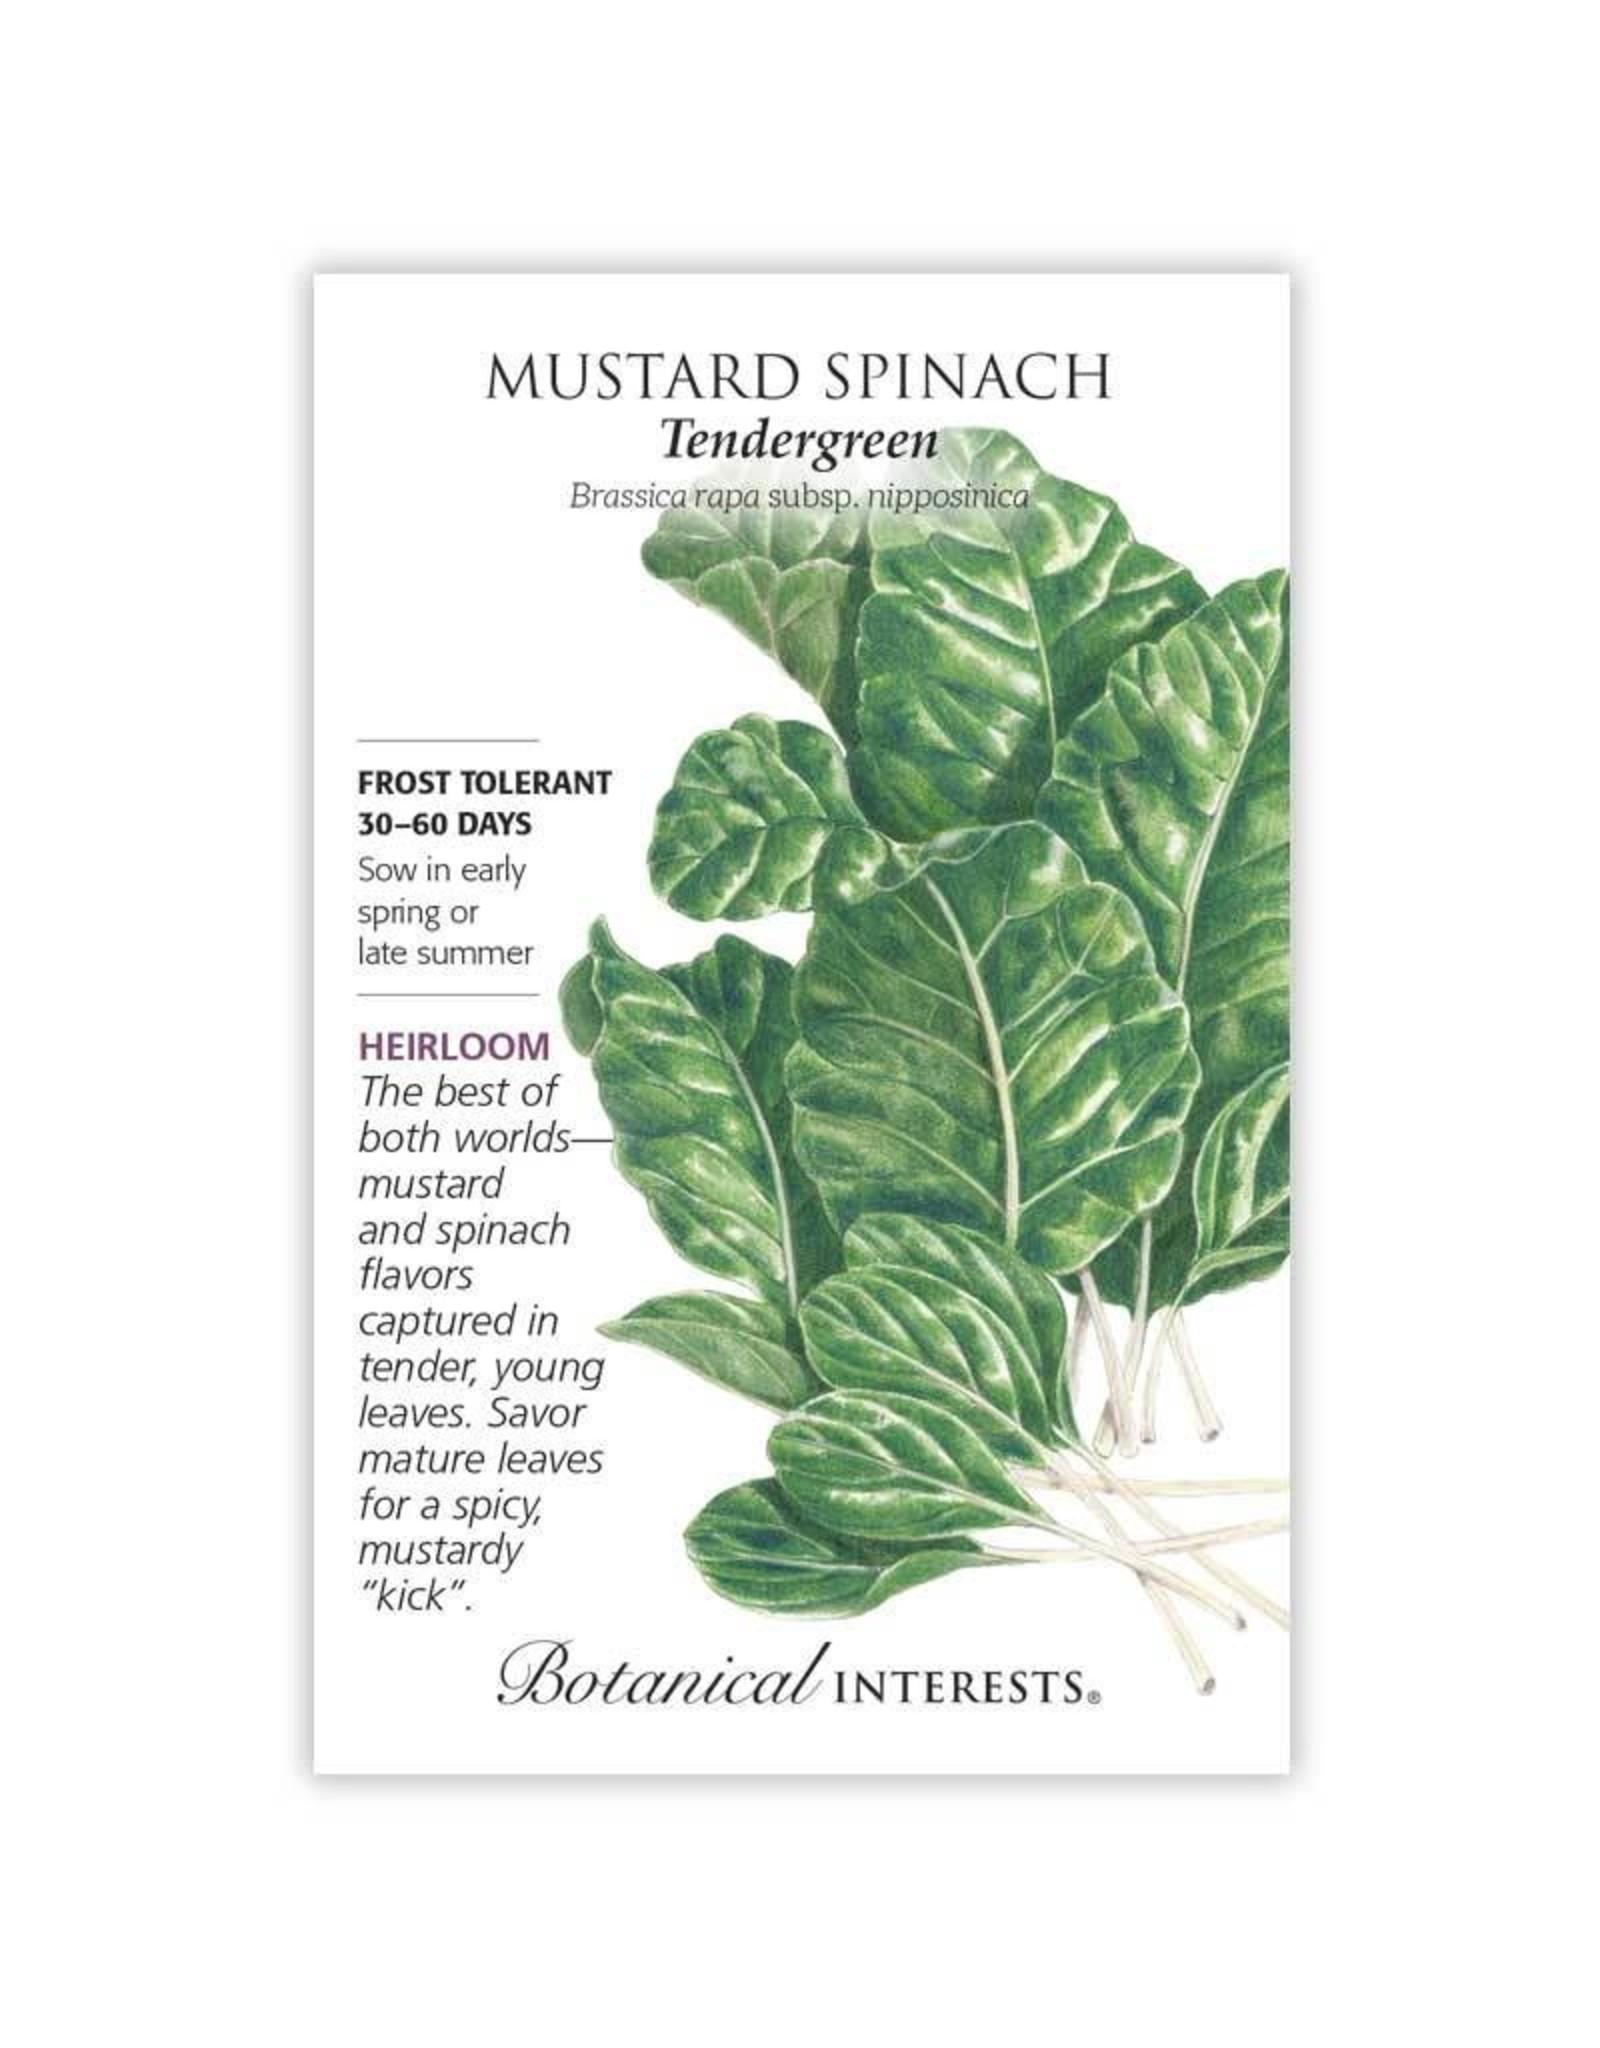 Seeds - Mustard Spinach Tendergreen